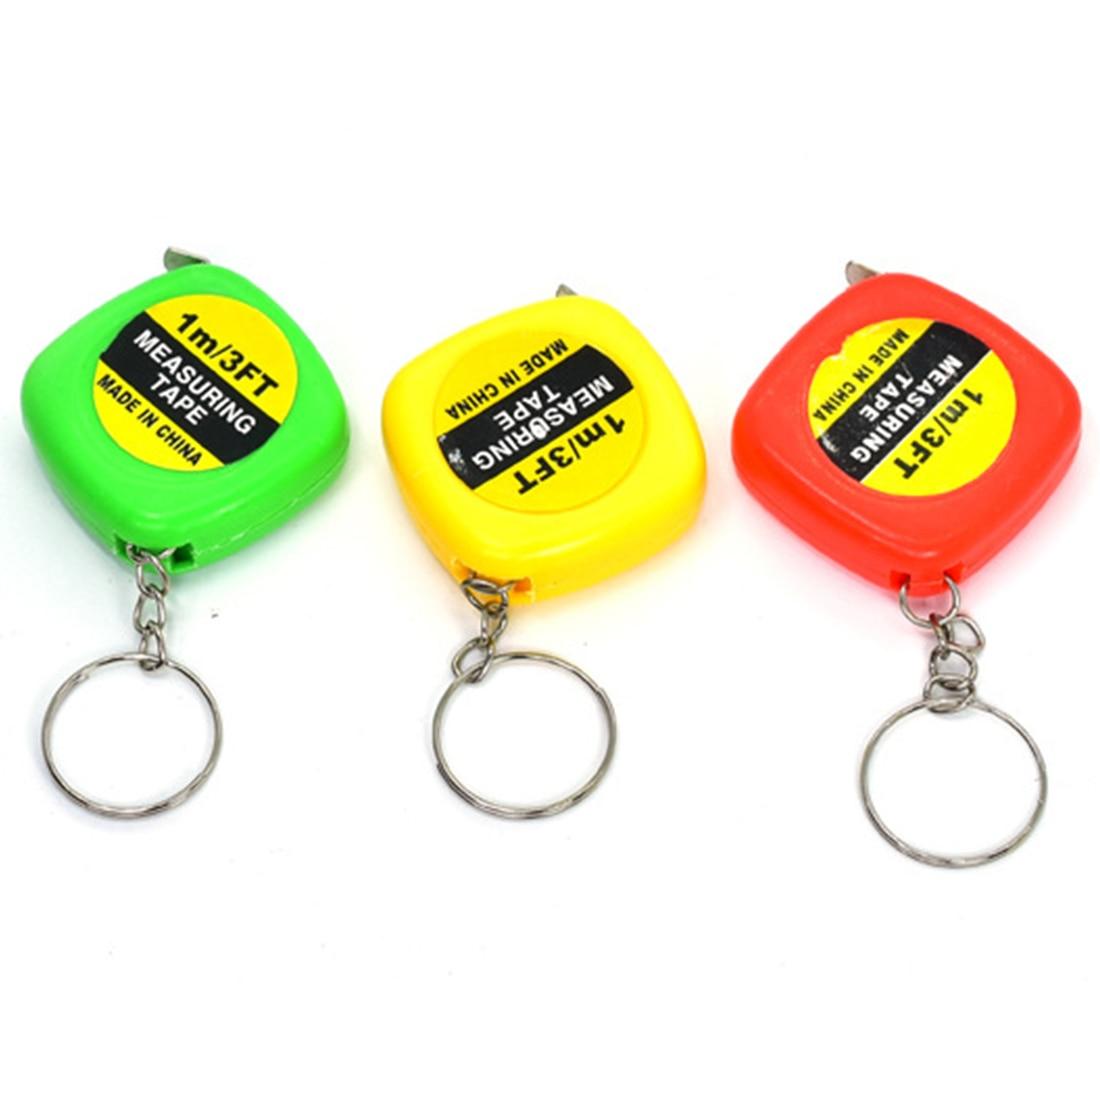 Hot 1pc 1m/3ft Easy Retractable Ruler Tape Measure Mini Portable Pull Ruler Keychain New Brand Color Random drone helipad